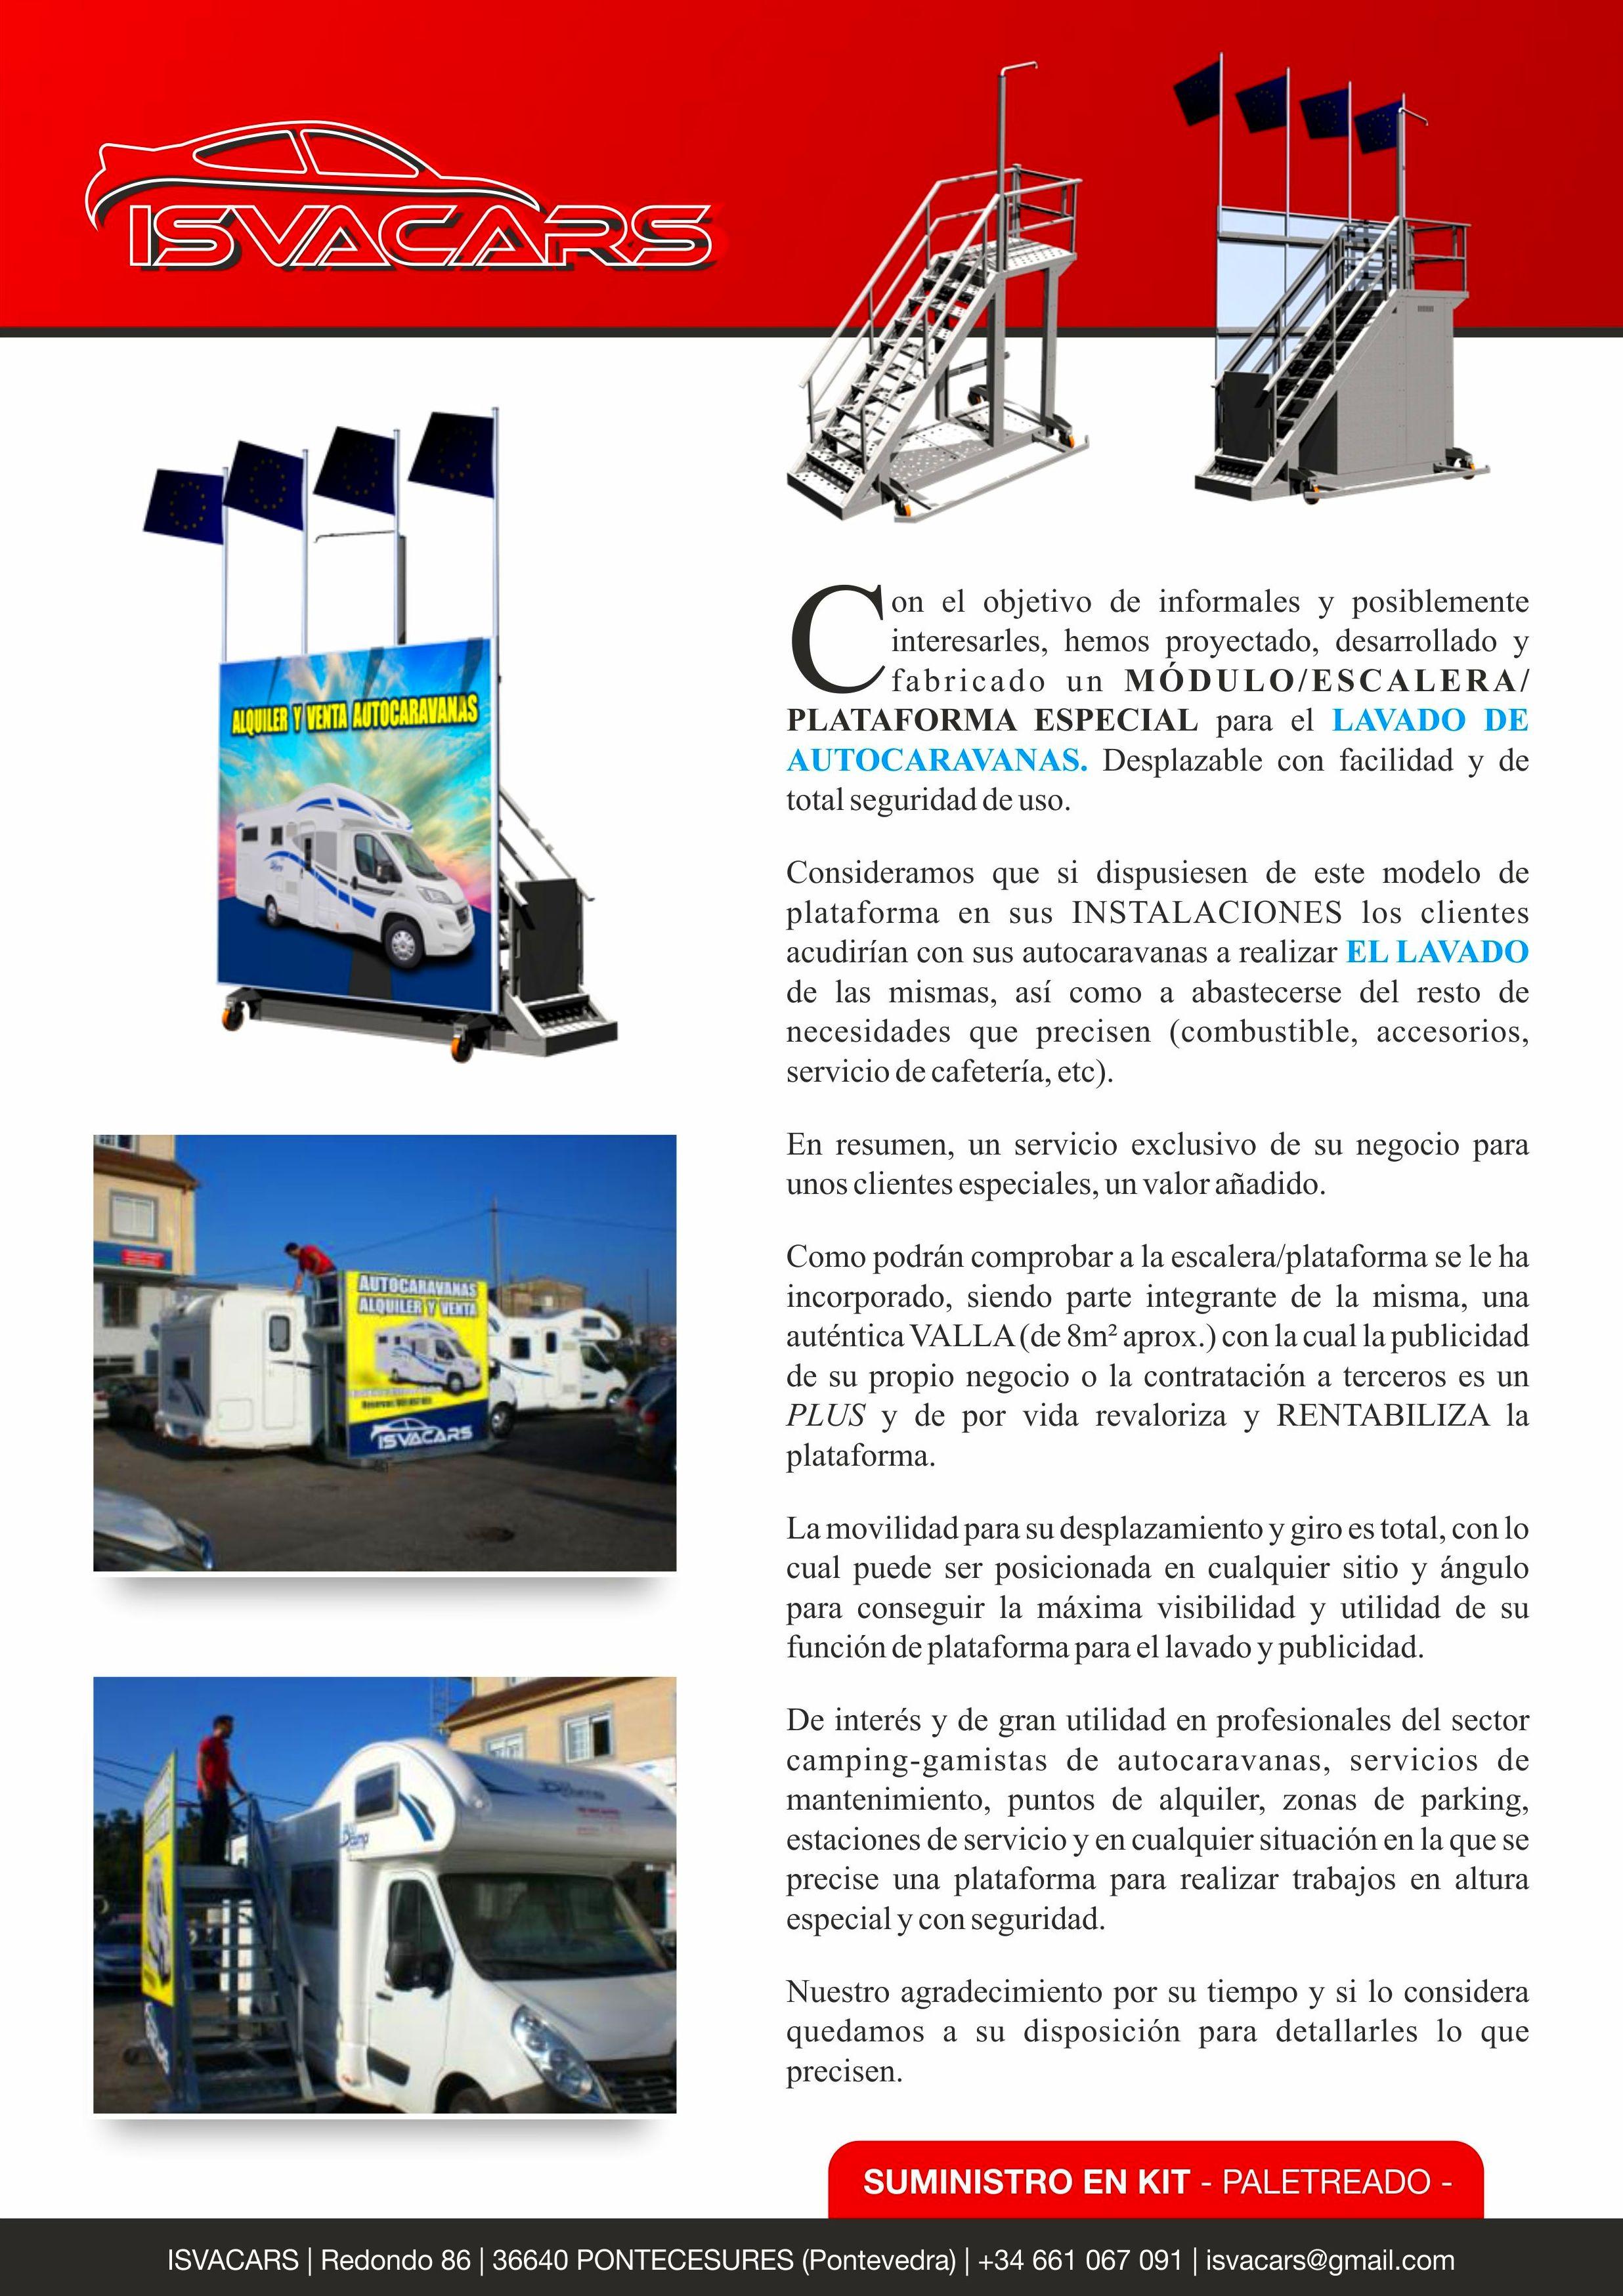 Escalera/Plataforma: Servicios de Isvacars Talleres